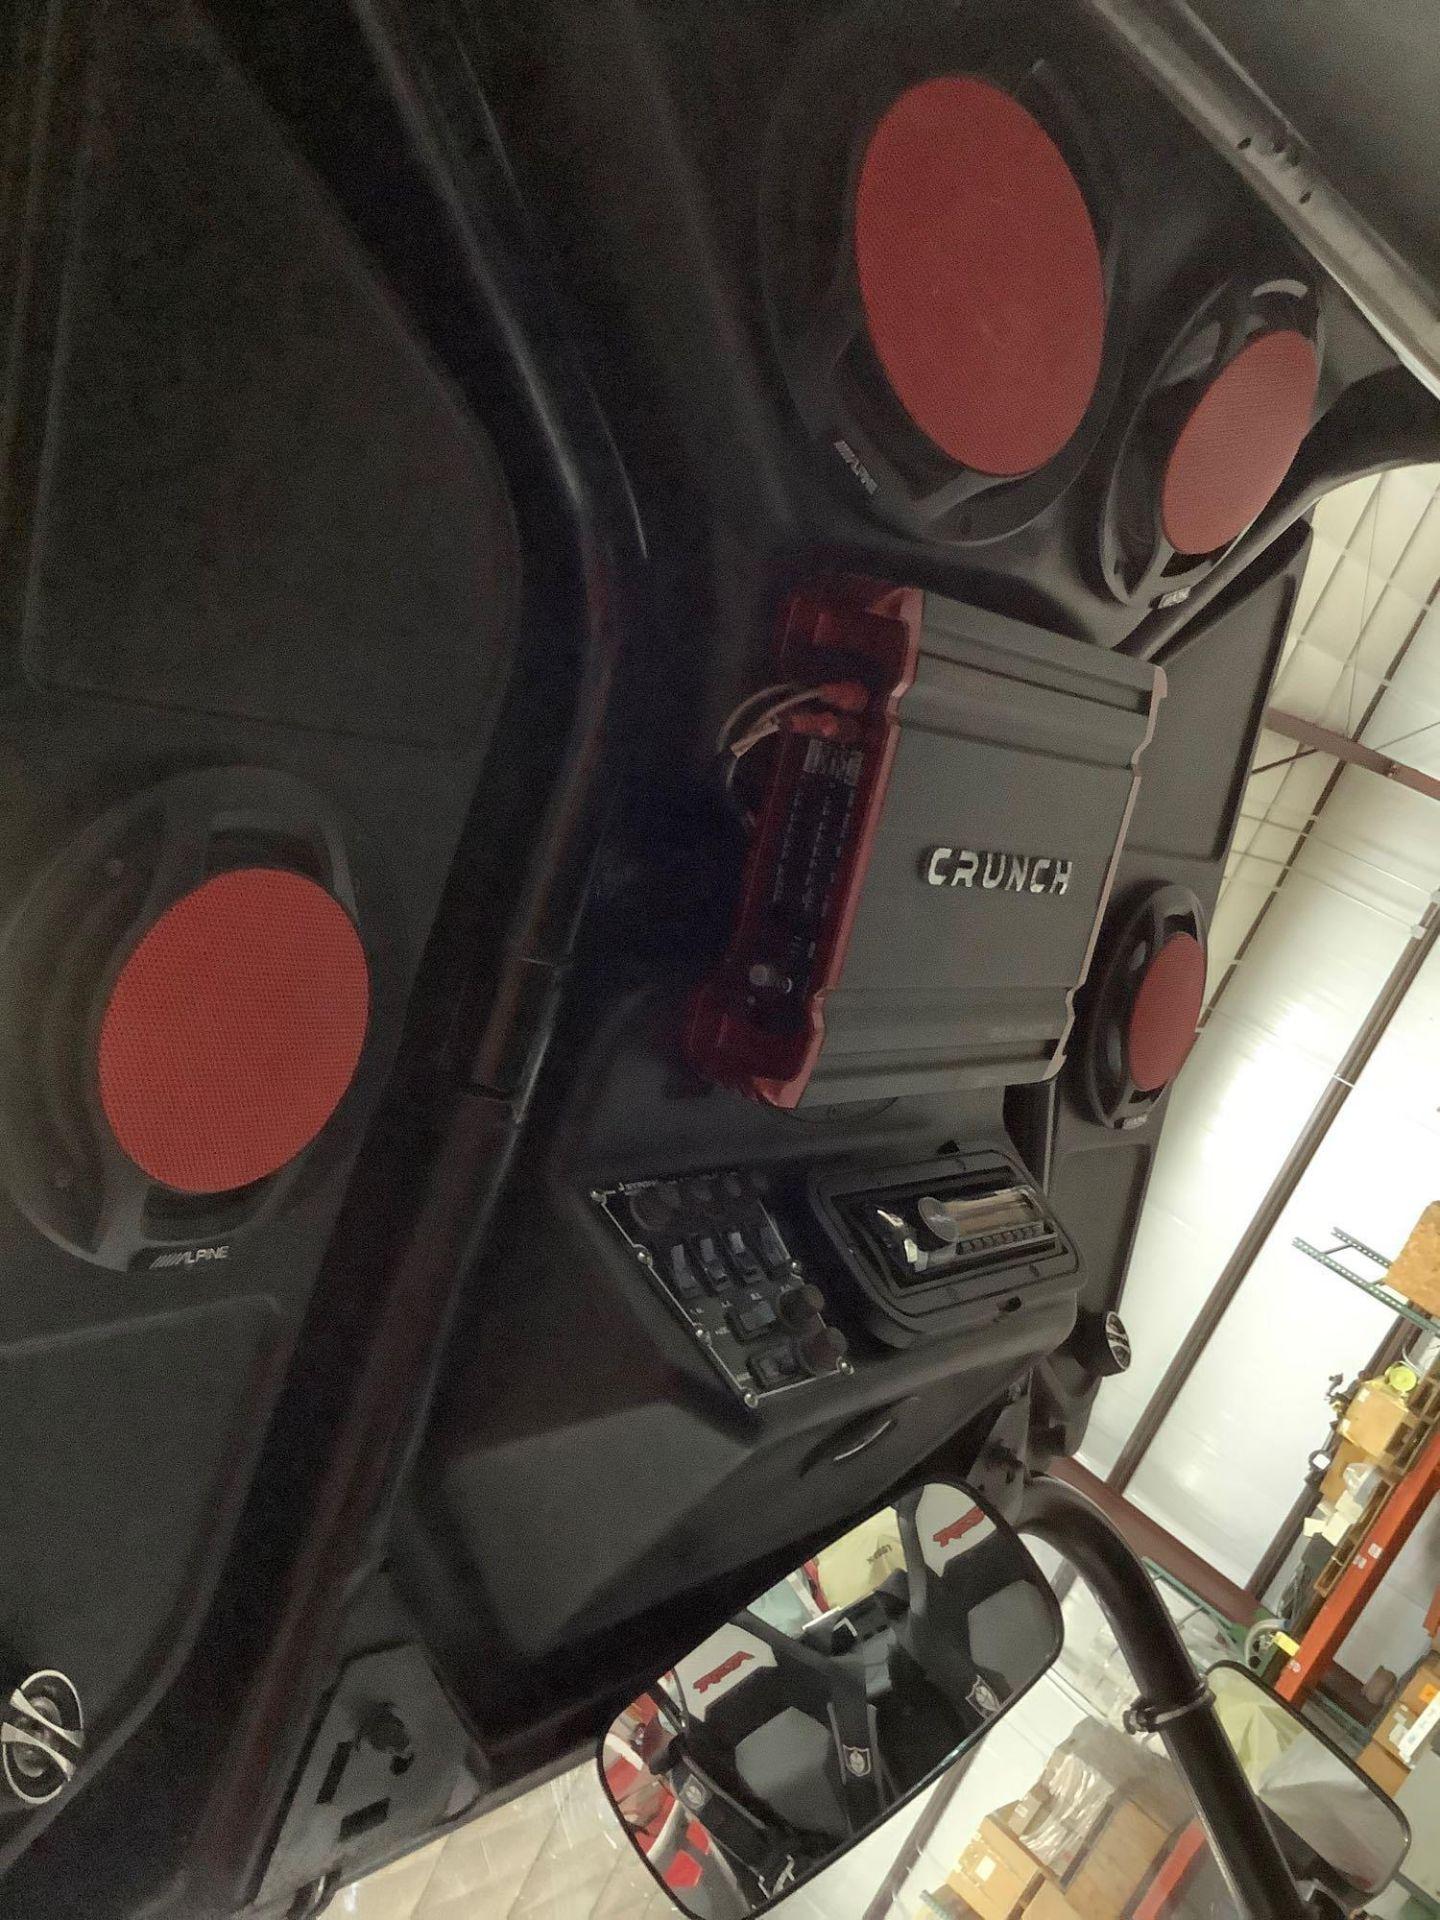 POLARIS RANGER RZR XP 900, TRINITY STAGE 5 RACING MUFFLER, SNORKEL INTAKE, CRUNCH 900 WATTS AMPLIFY - Image 14 of 22